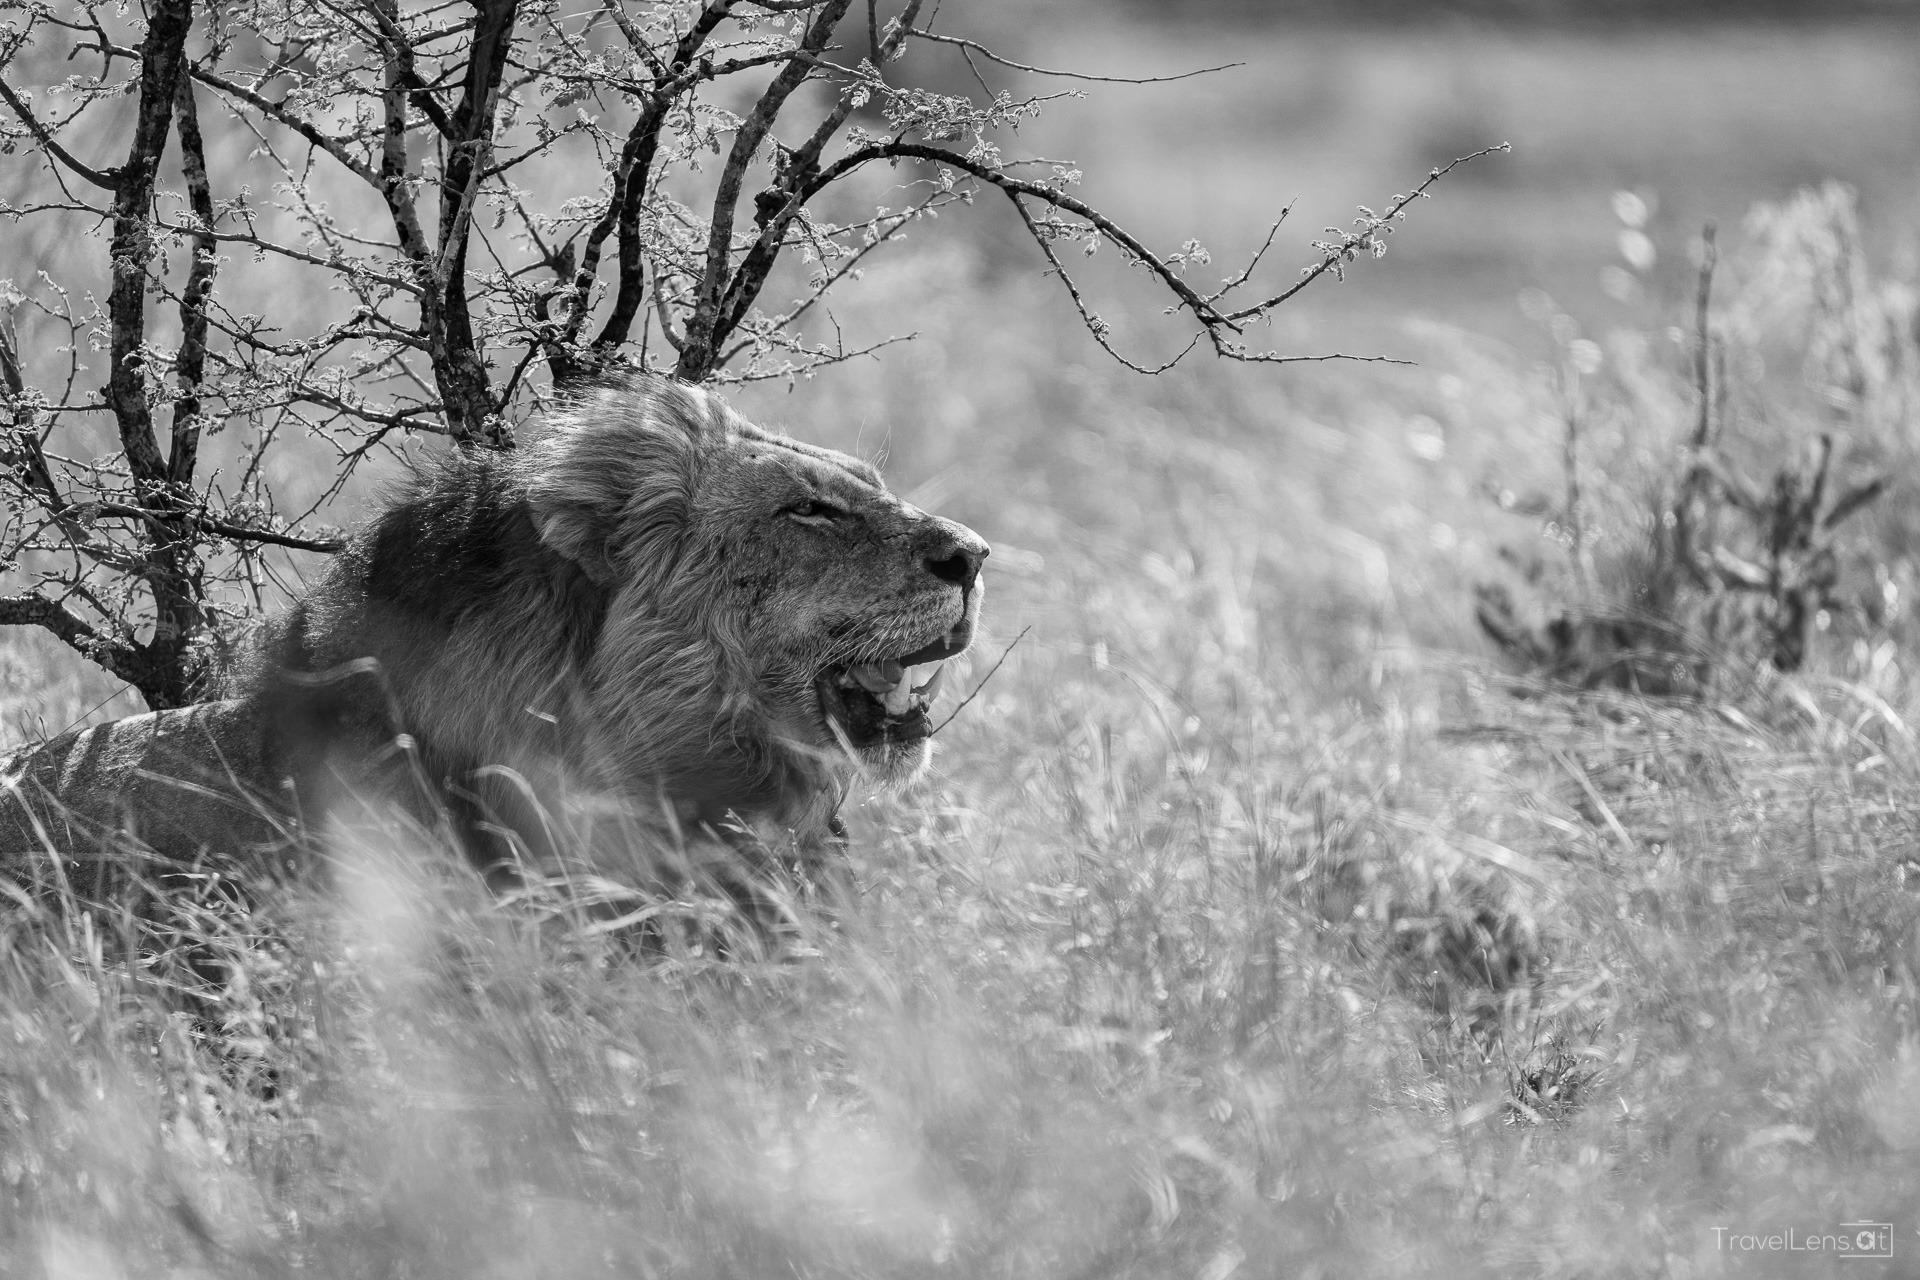 Südafrika Tag 6 – Zurück in den Kruger Nationalpark (Teil 2)